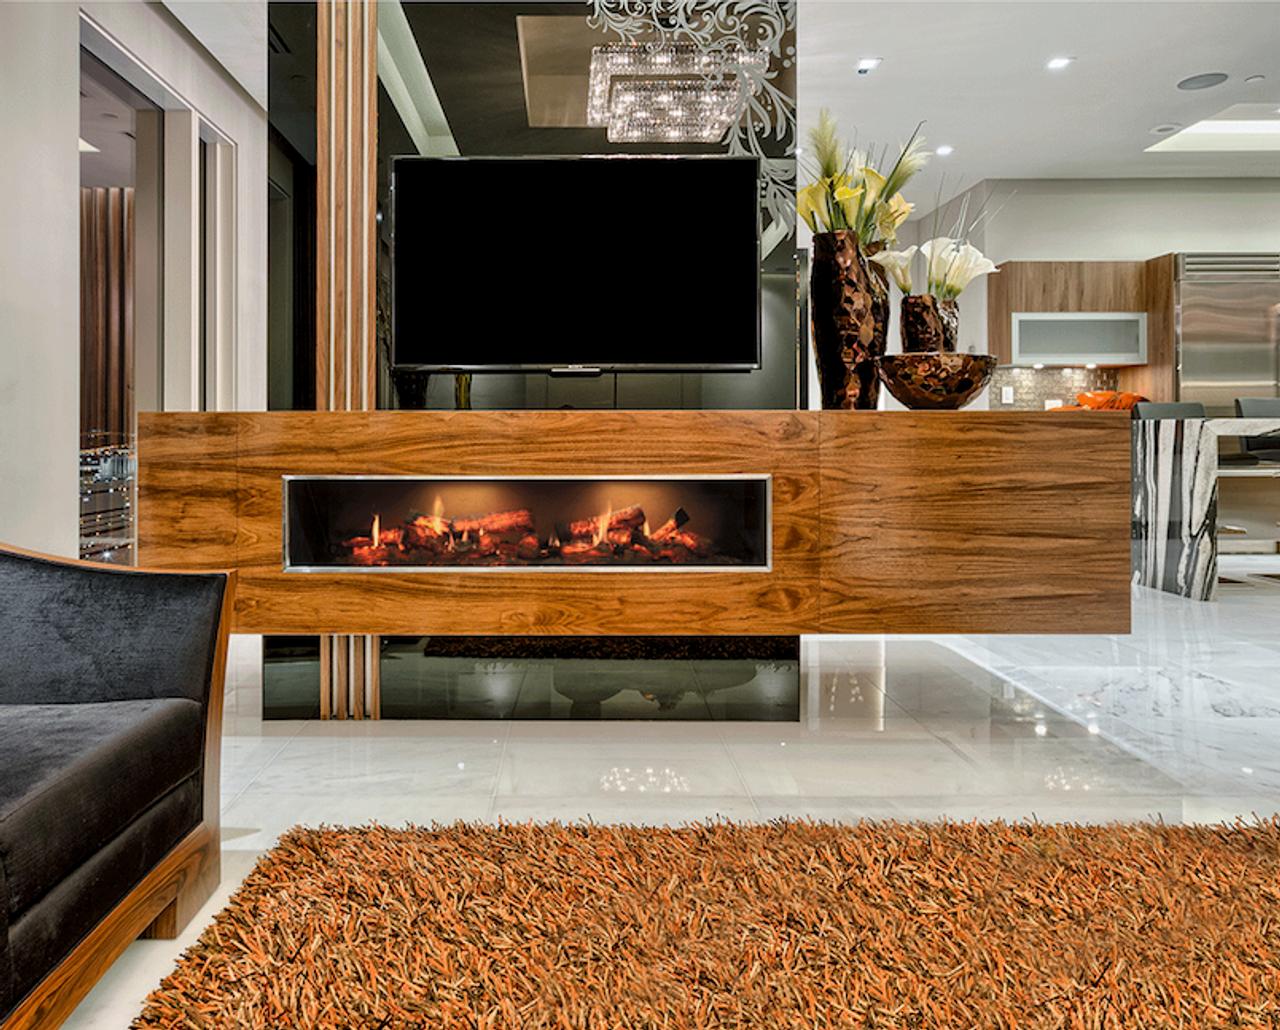 Dimplex Opti-V Duet Linear Electric Fireplace